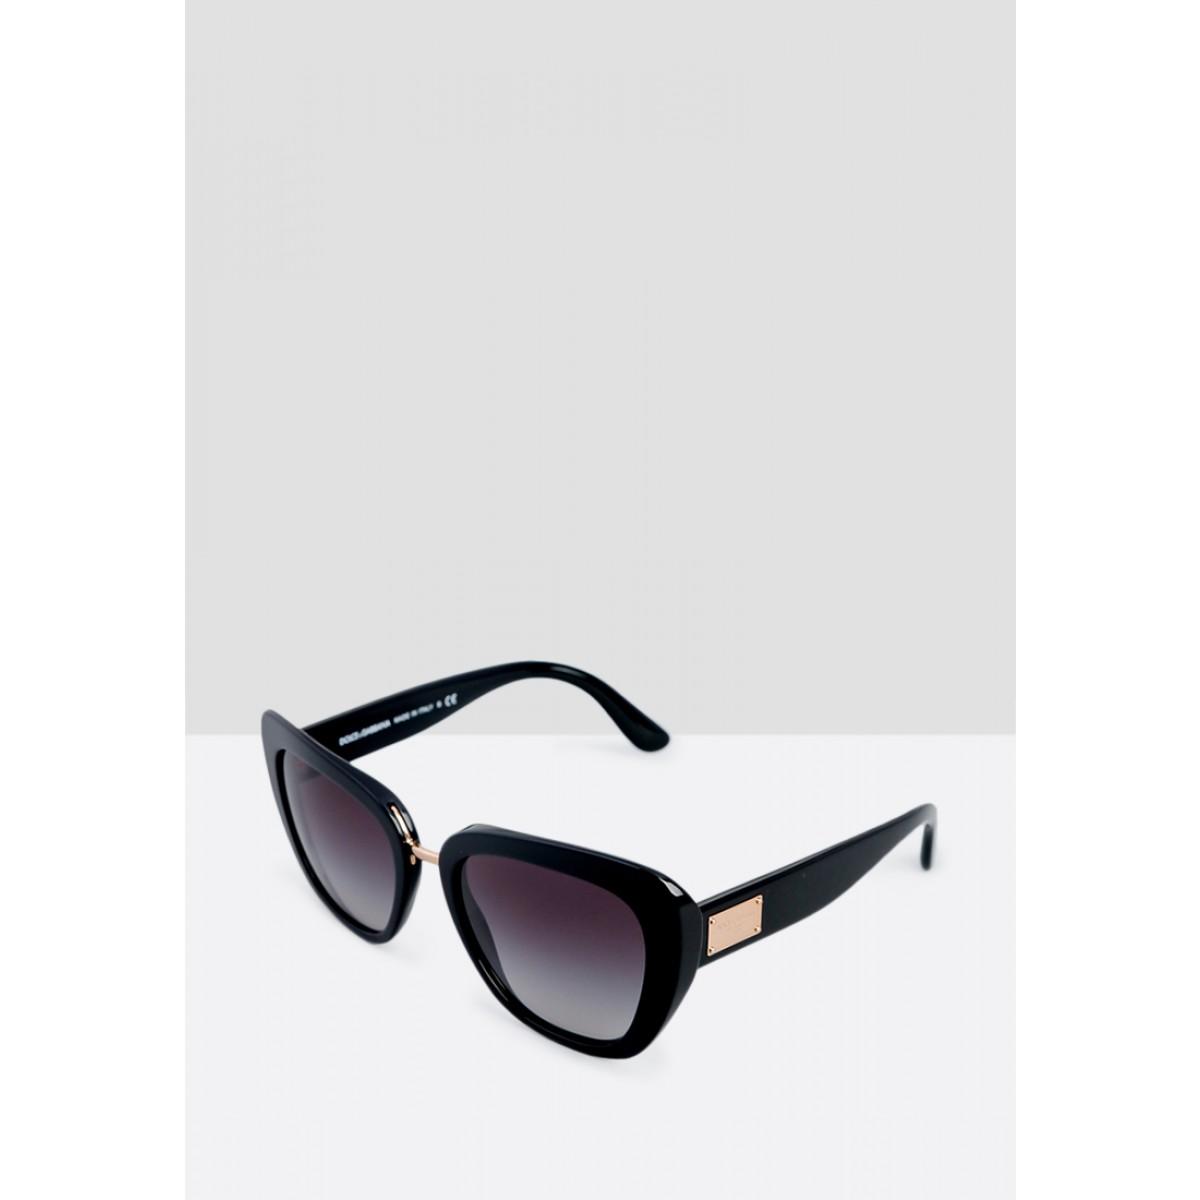 ca9cab364d8 Dolce   Gabbana Black Cateye Women Sunglasses DG4296-501 8G-53 - Sunglasses  - Fashion World